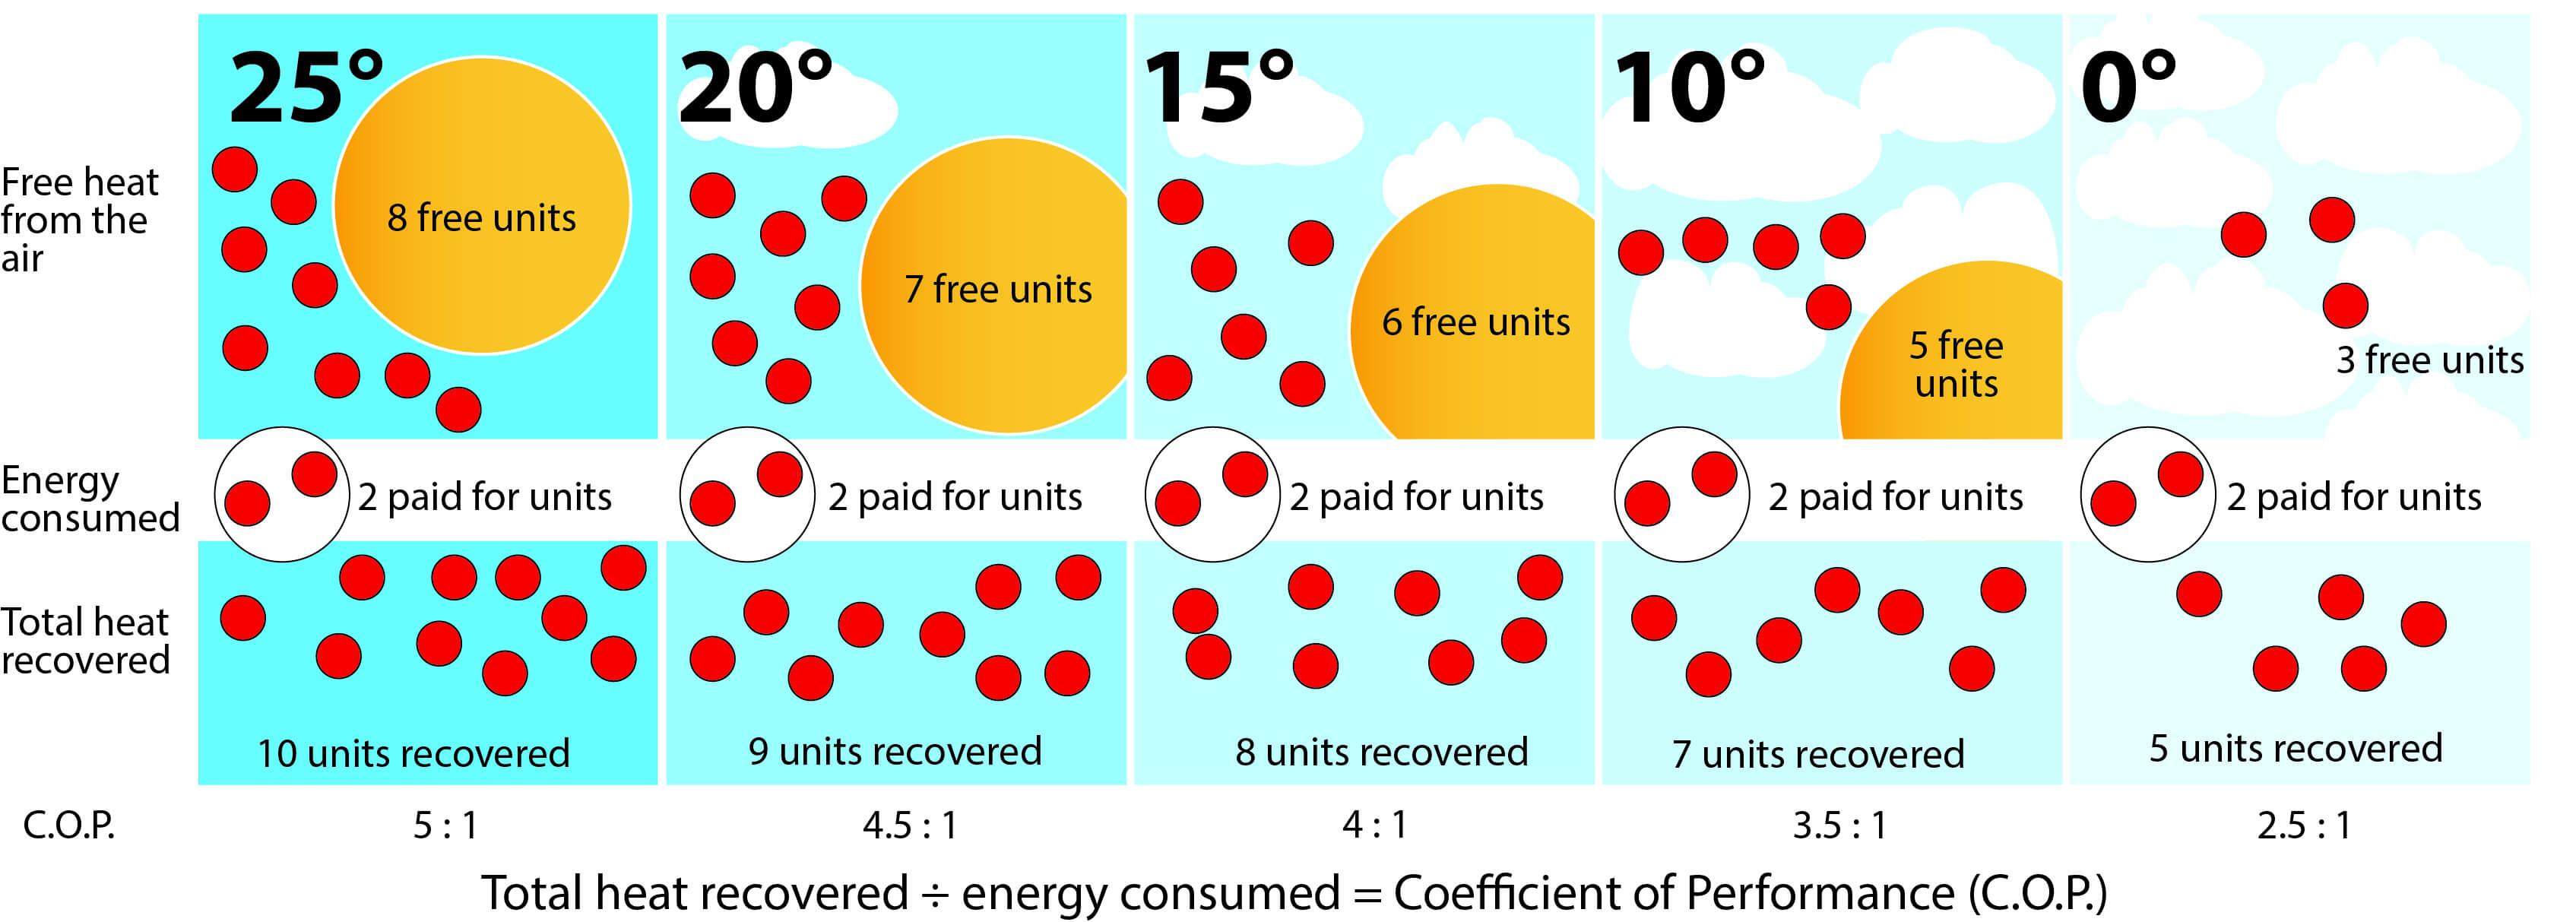 Heat pump efficiency at differing air temperatures